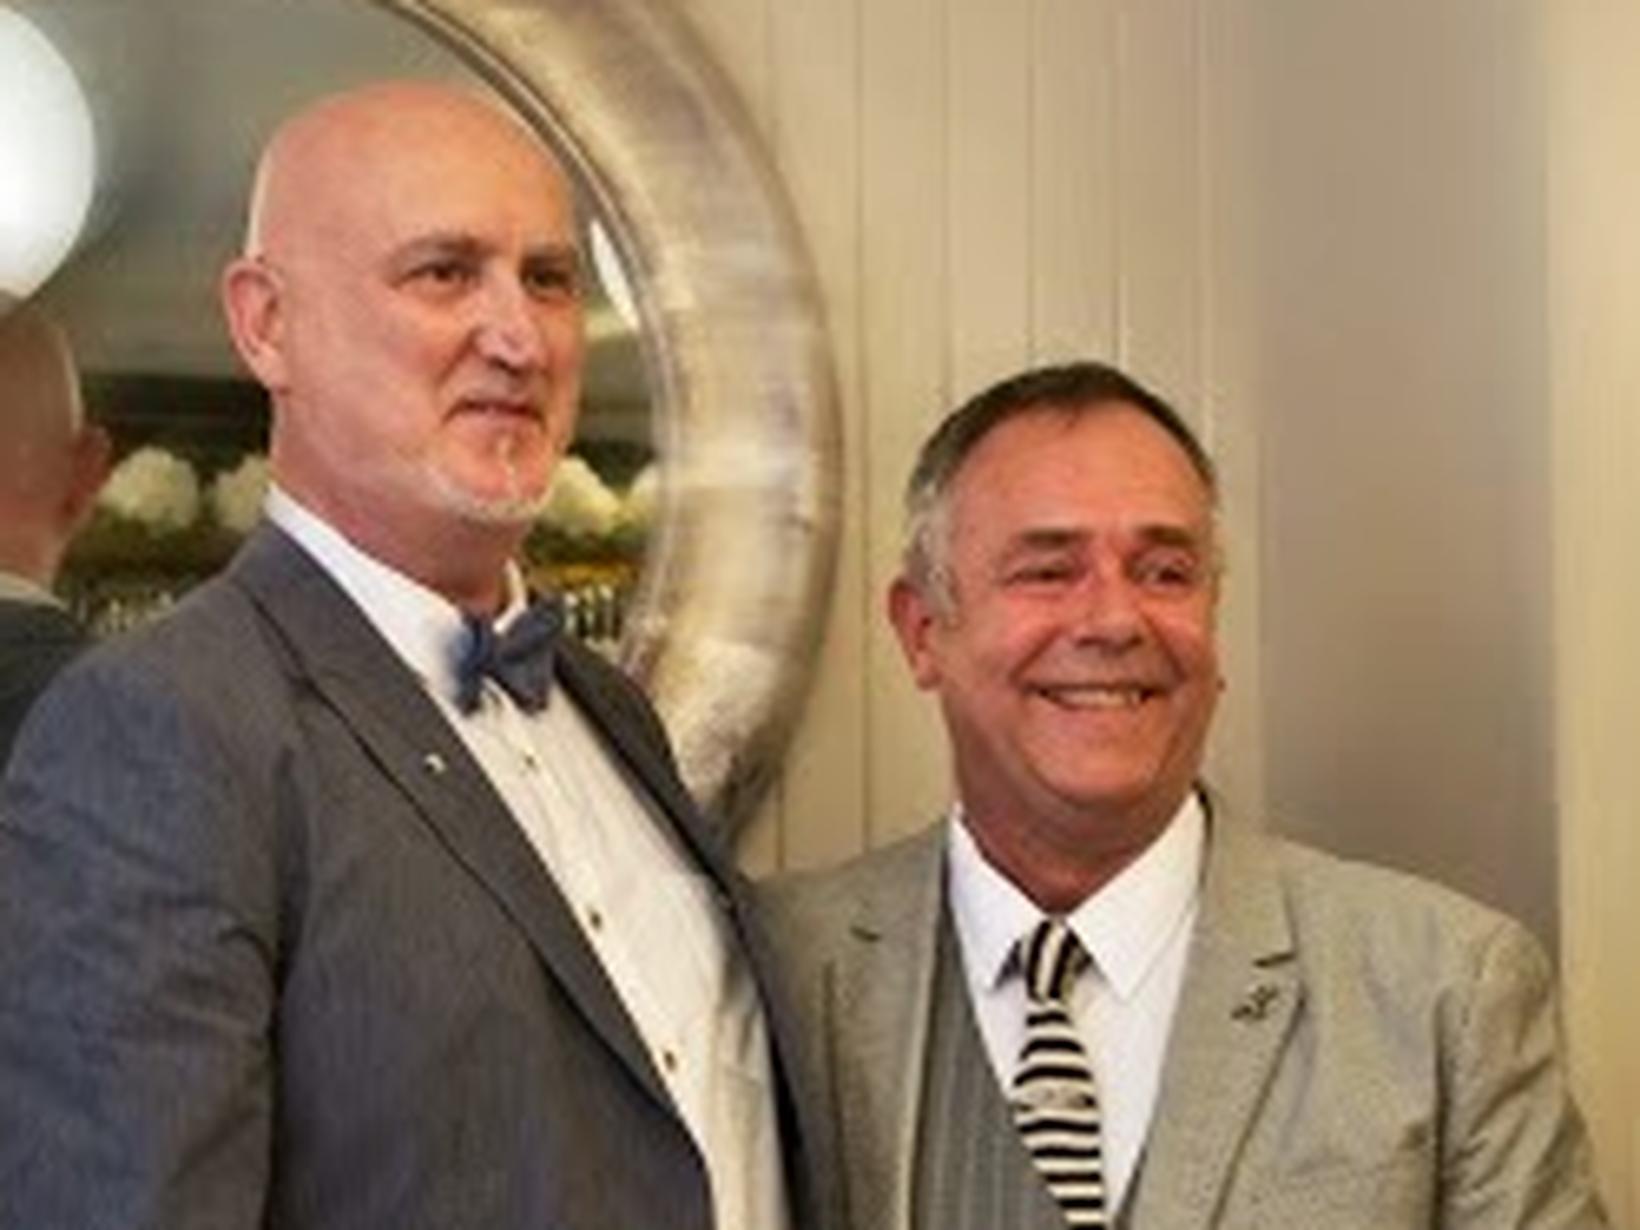 Pj & Kenneth from Cork, Ireland